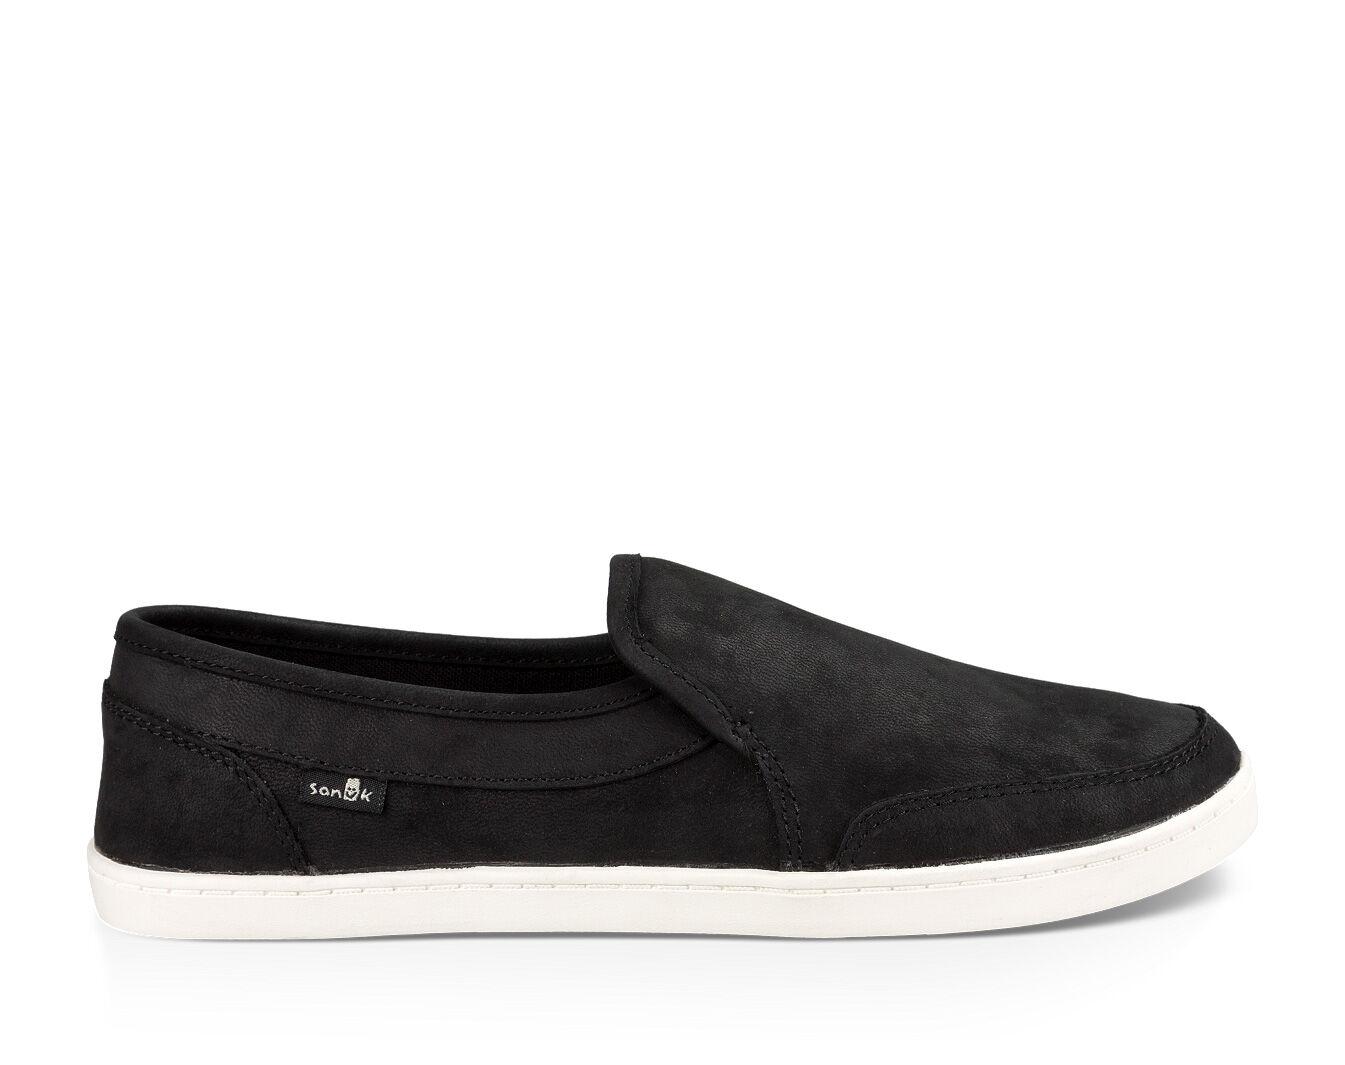 Womens Black Leather Slip On Sneakers